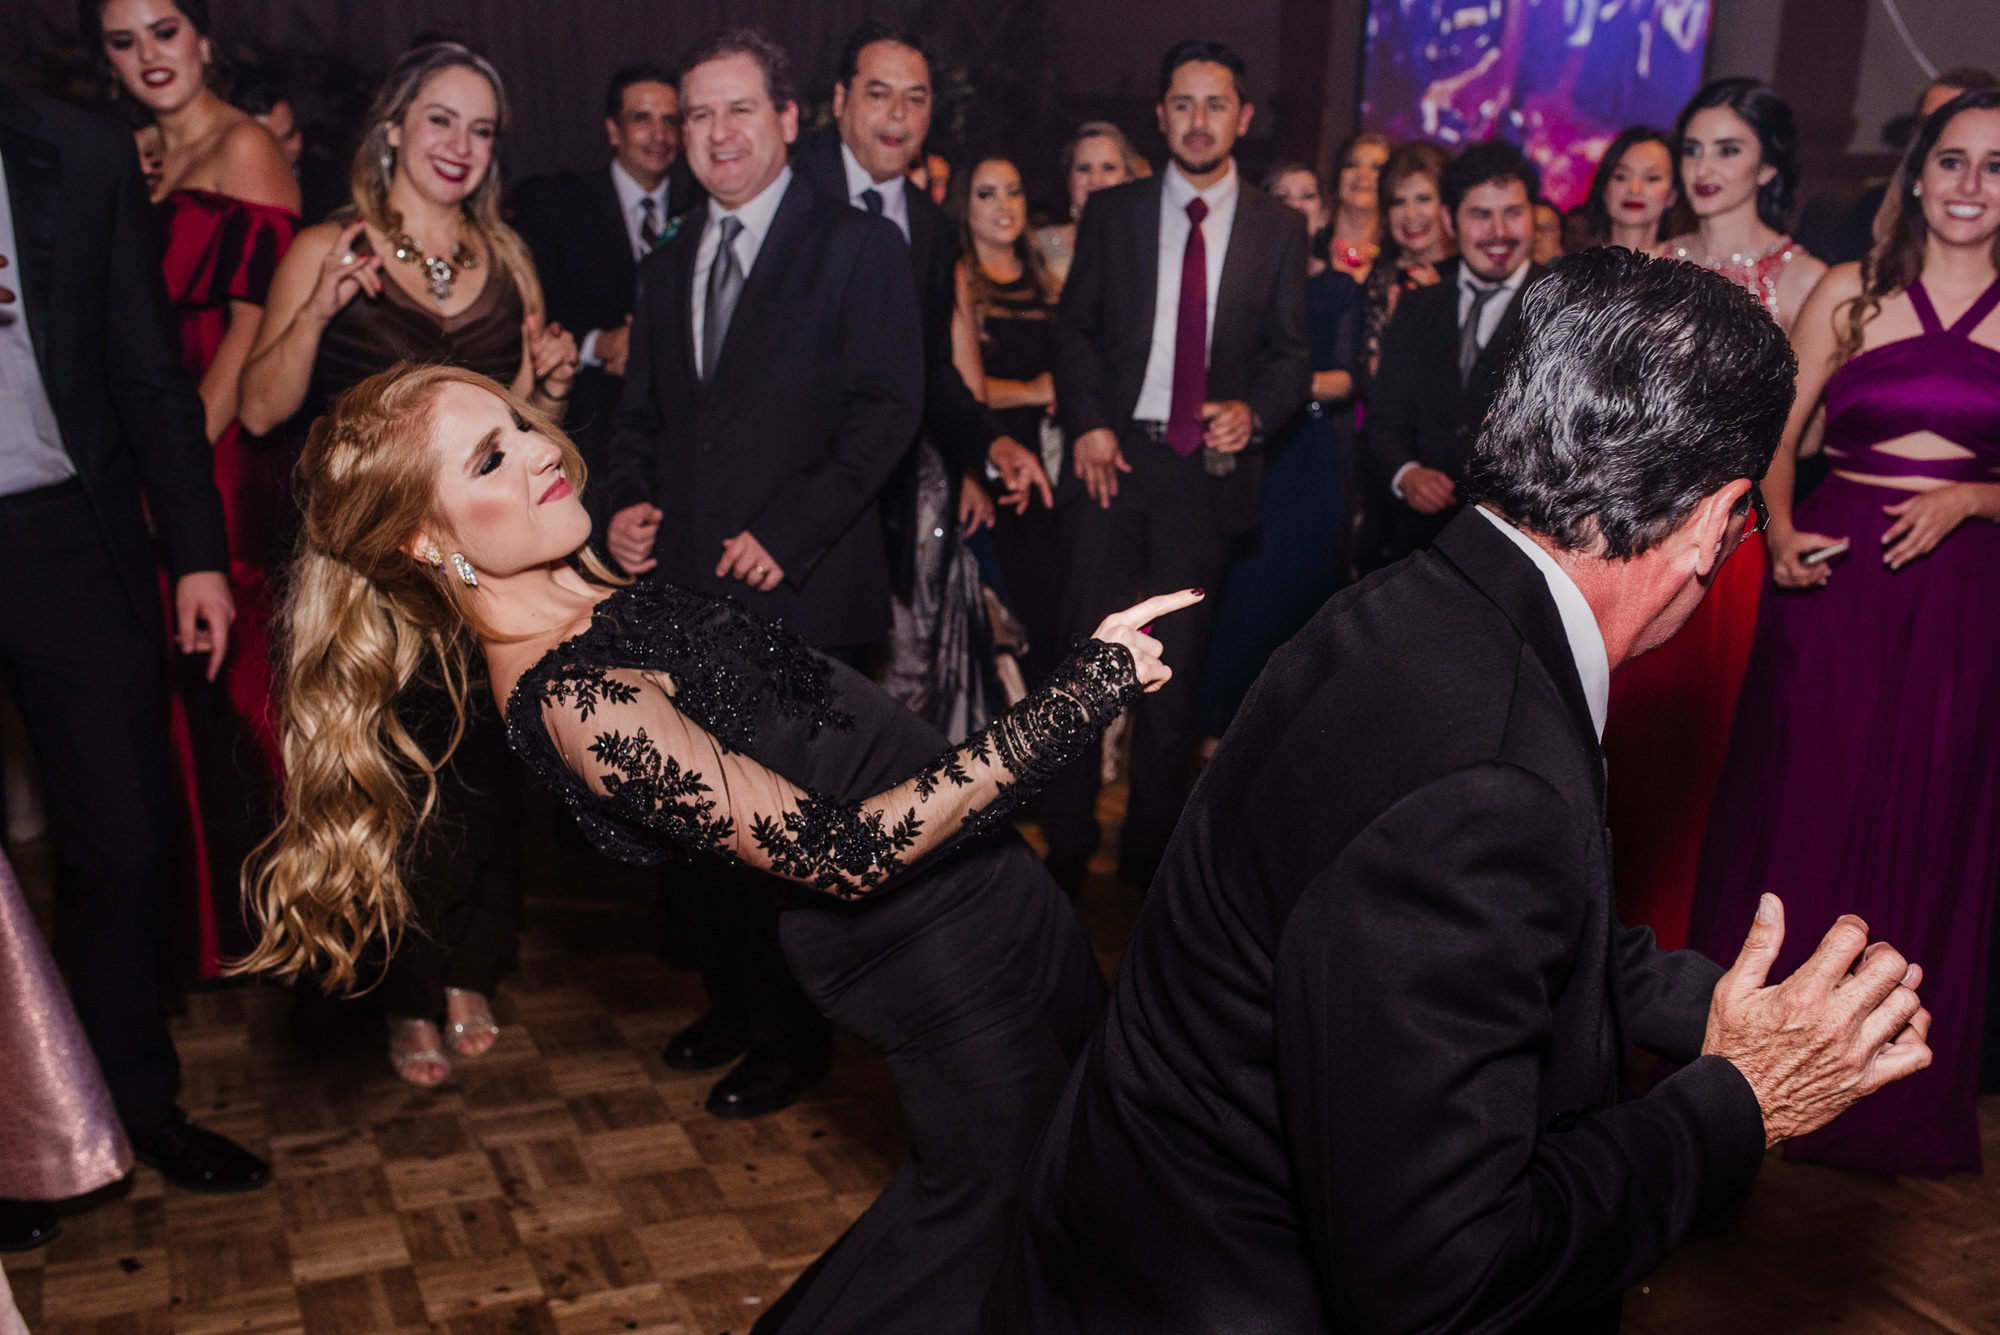 Mario-Karla-Wedding-300